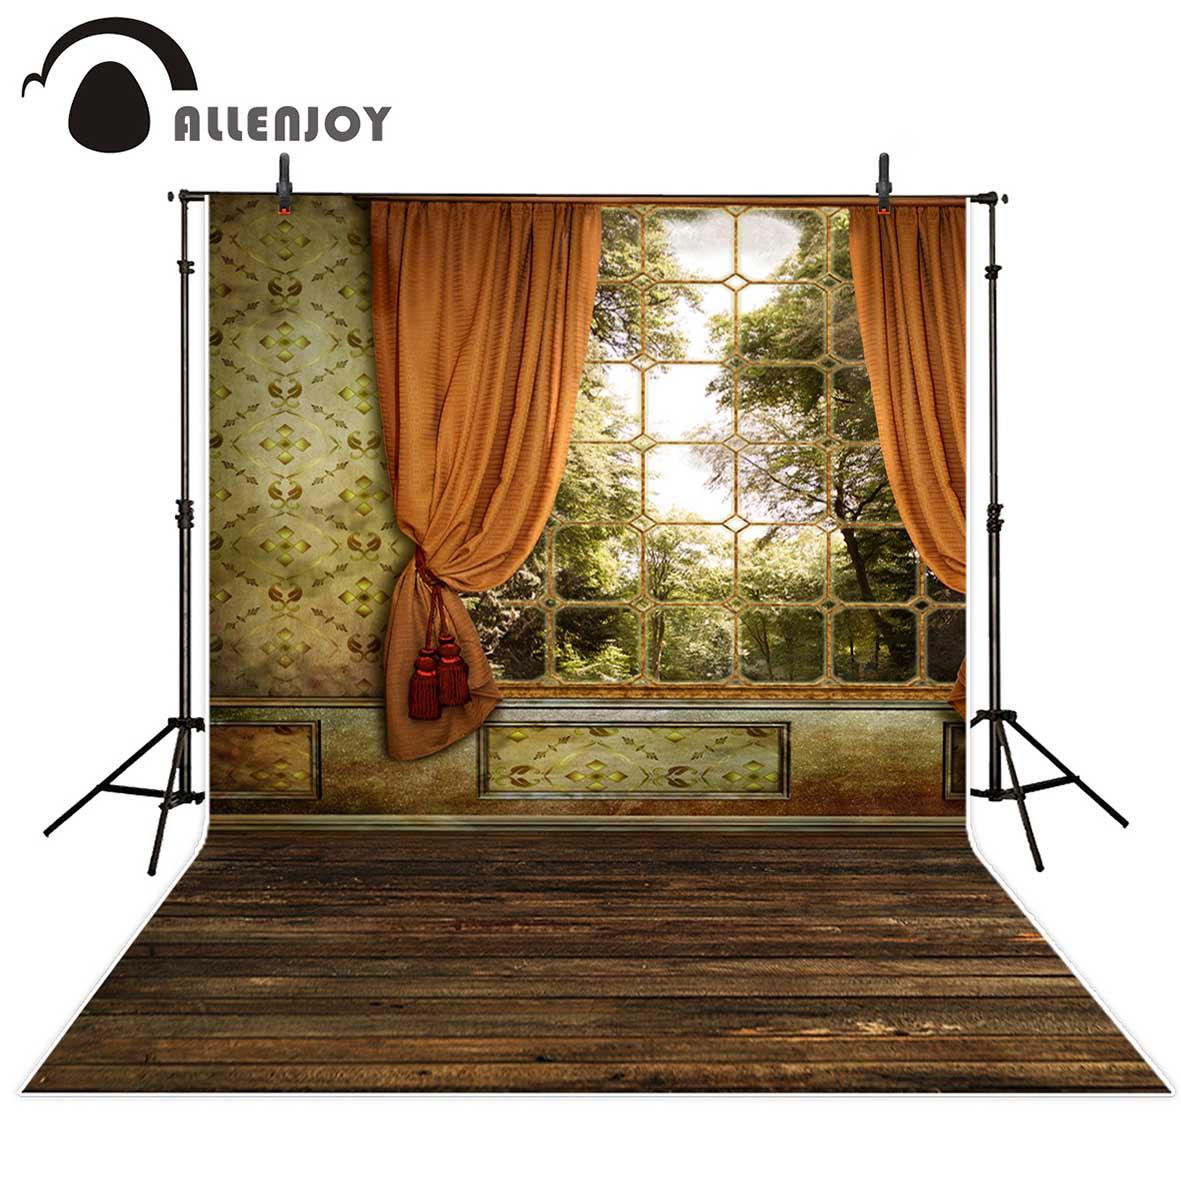 Allenjoy photography backdrops beautiful window Curtain Palace Wooden floor vinyl photography backdrops studio background vinyl